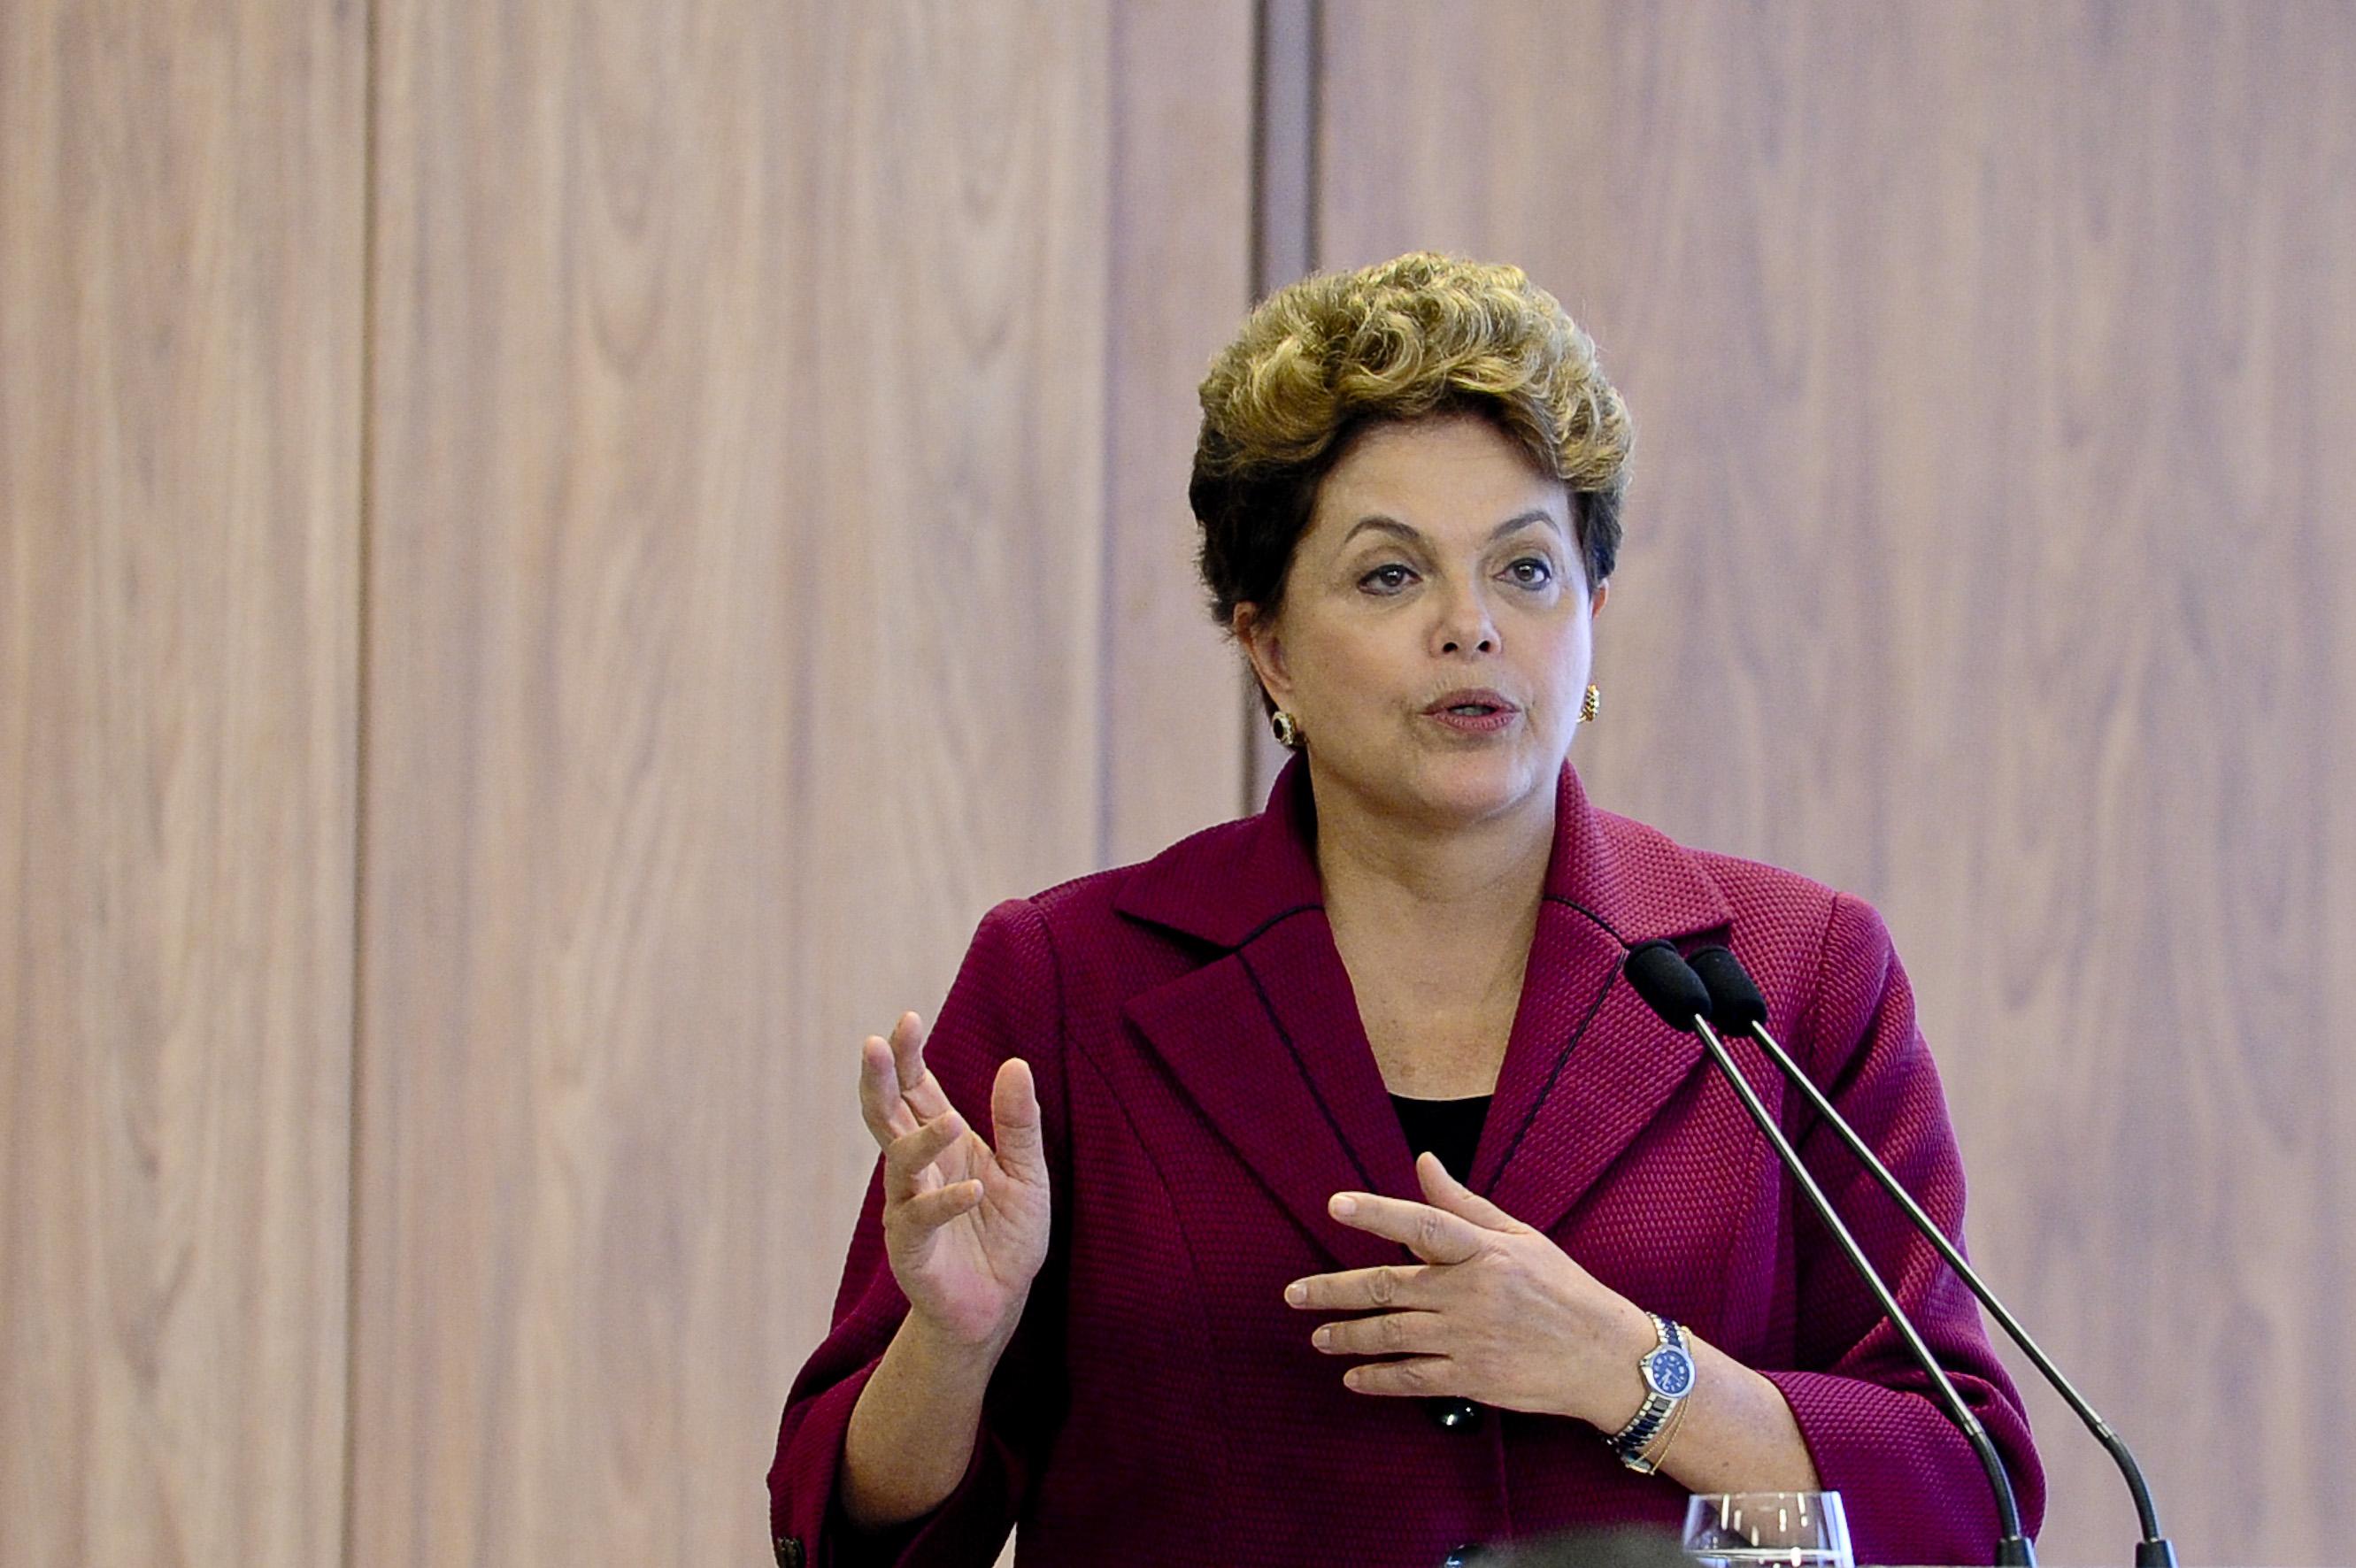 Brasilia - Presidenta Dilma Rousseff recebe o presidente da Ucr‰nia, Viktor Yanukovitch